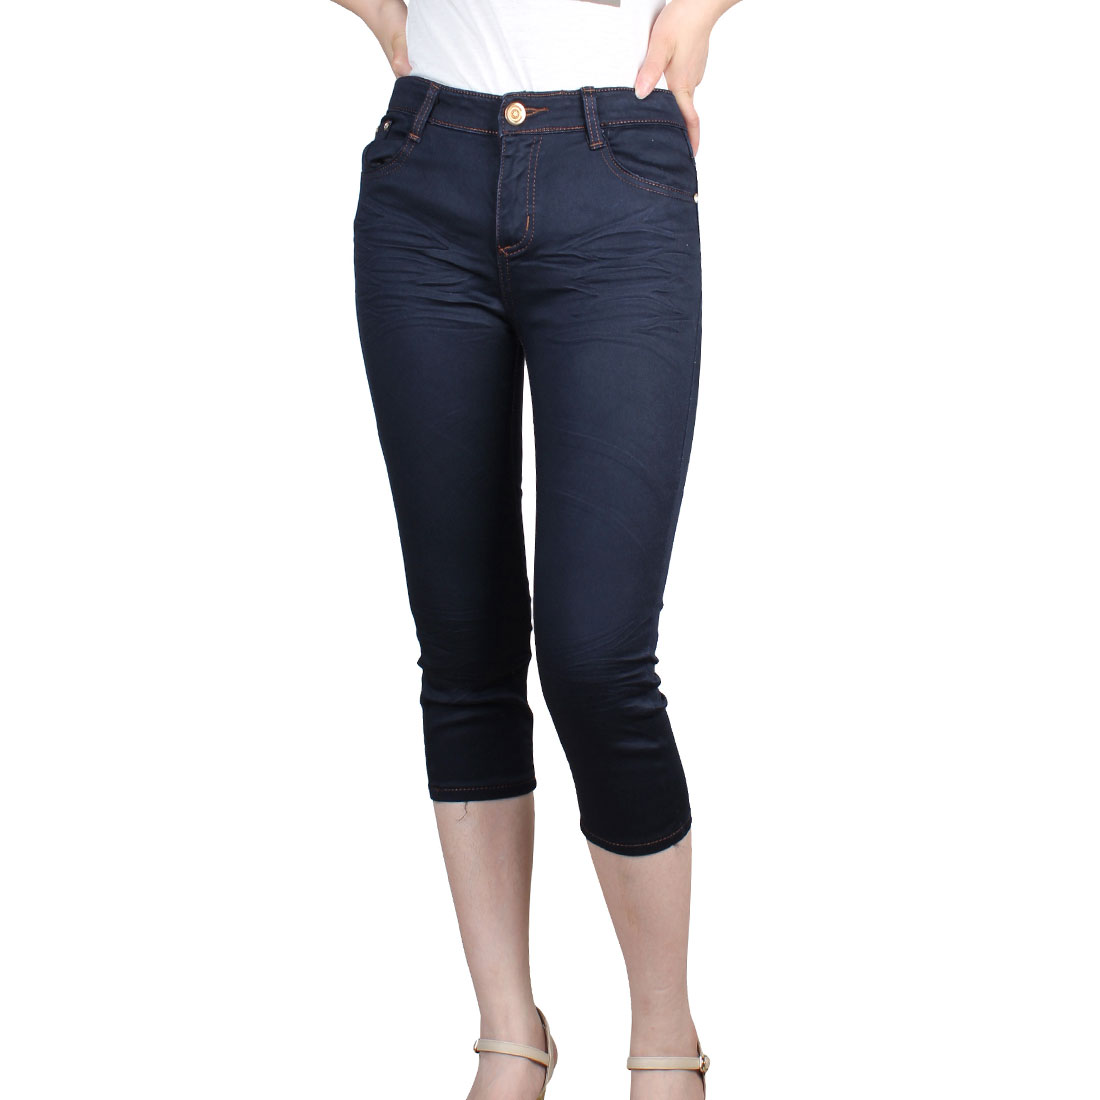 Woman Rhinestone Studs Nailhead Detail Slant Pockets Capris Jeans Navy Blue XS